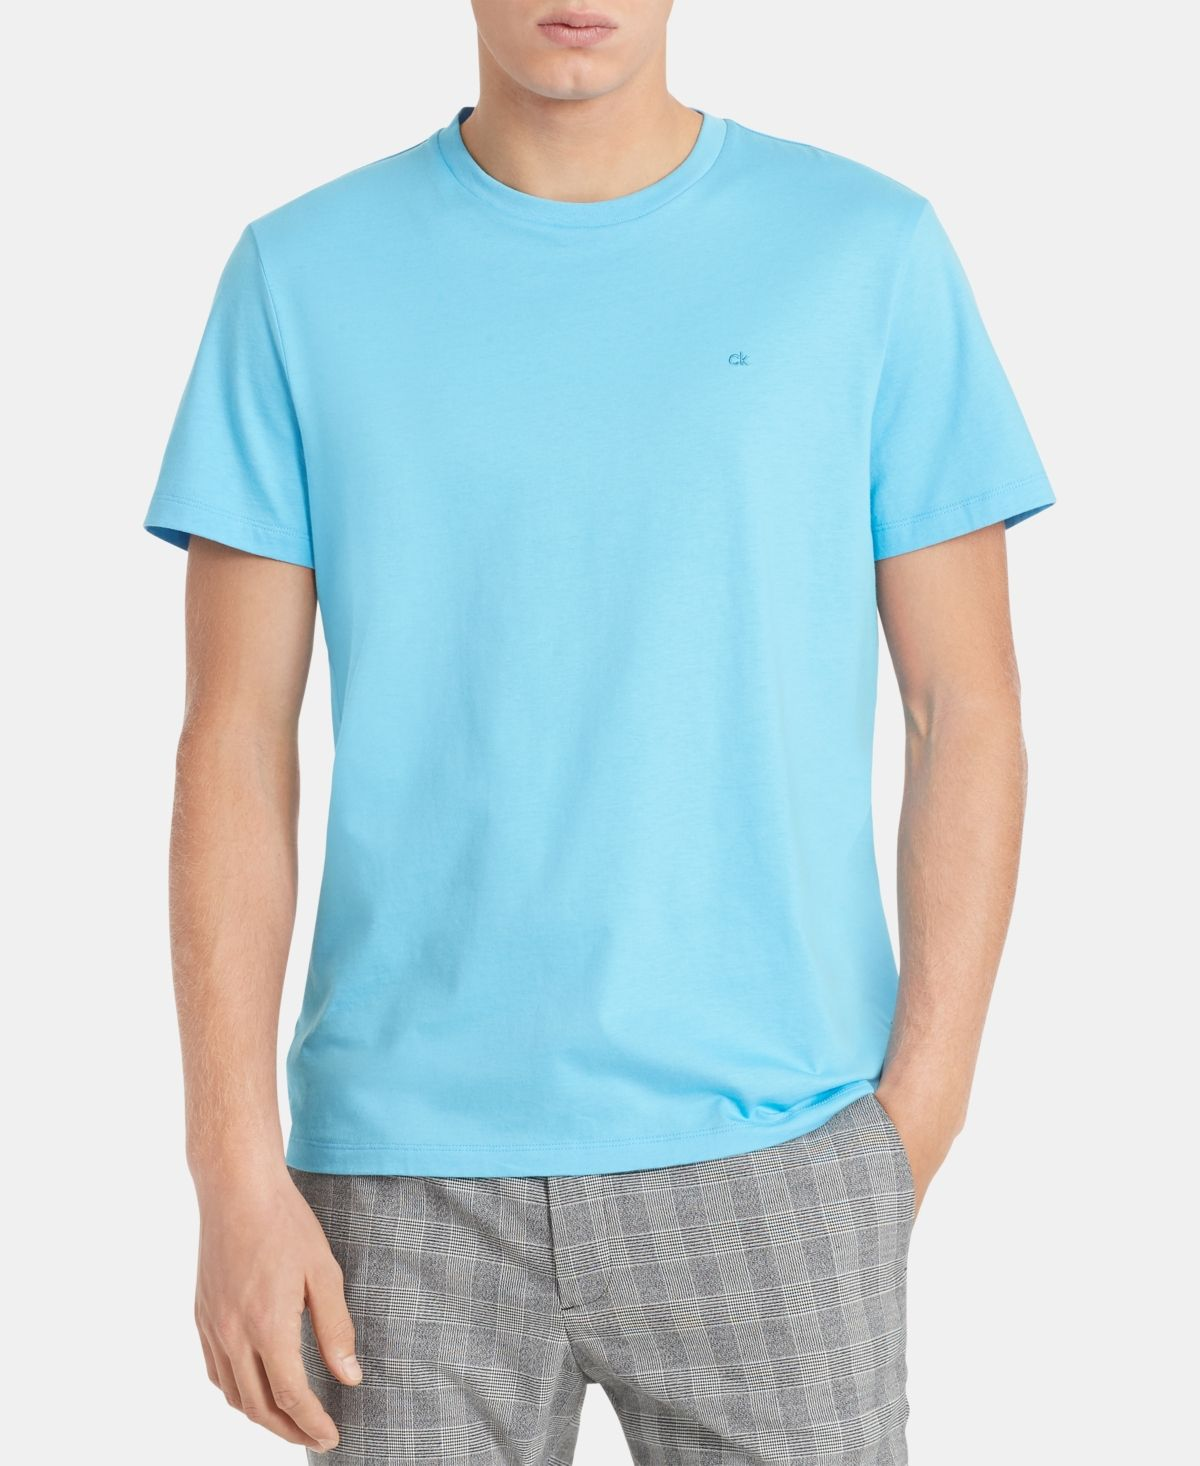 First brand t shirt california san francisco Denim top mens  S-3XL